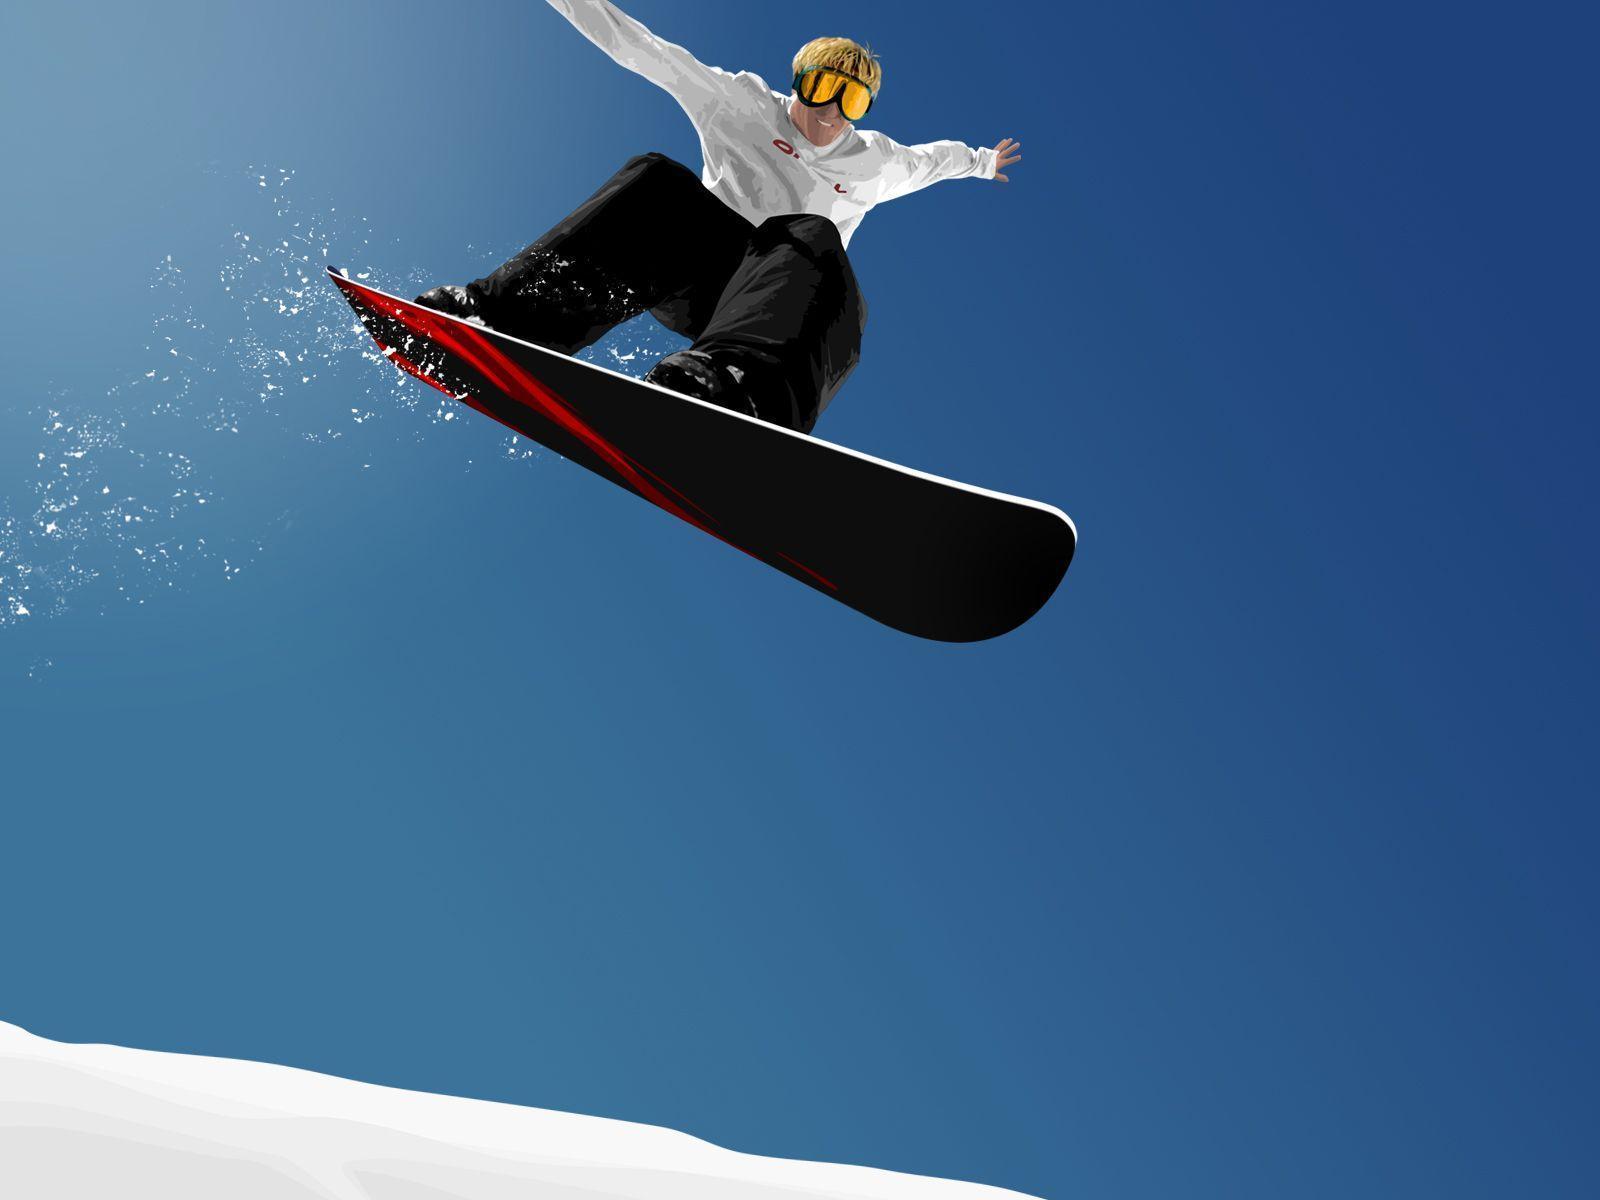 Shaun white snowboarding wallpaper